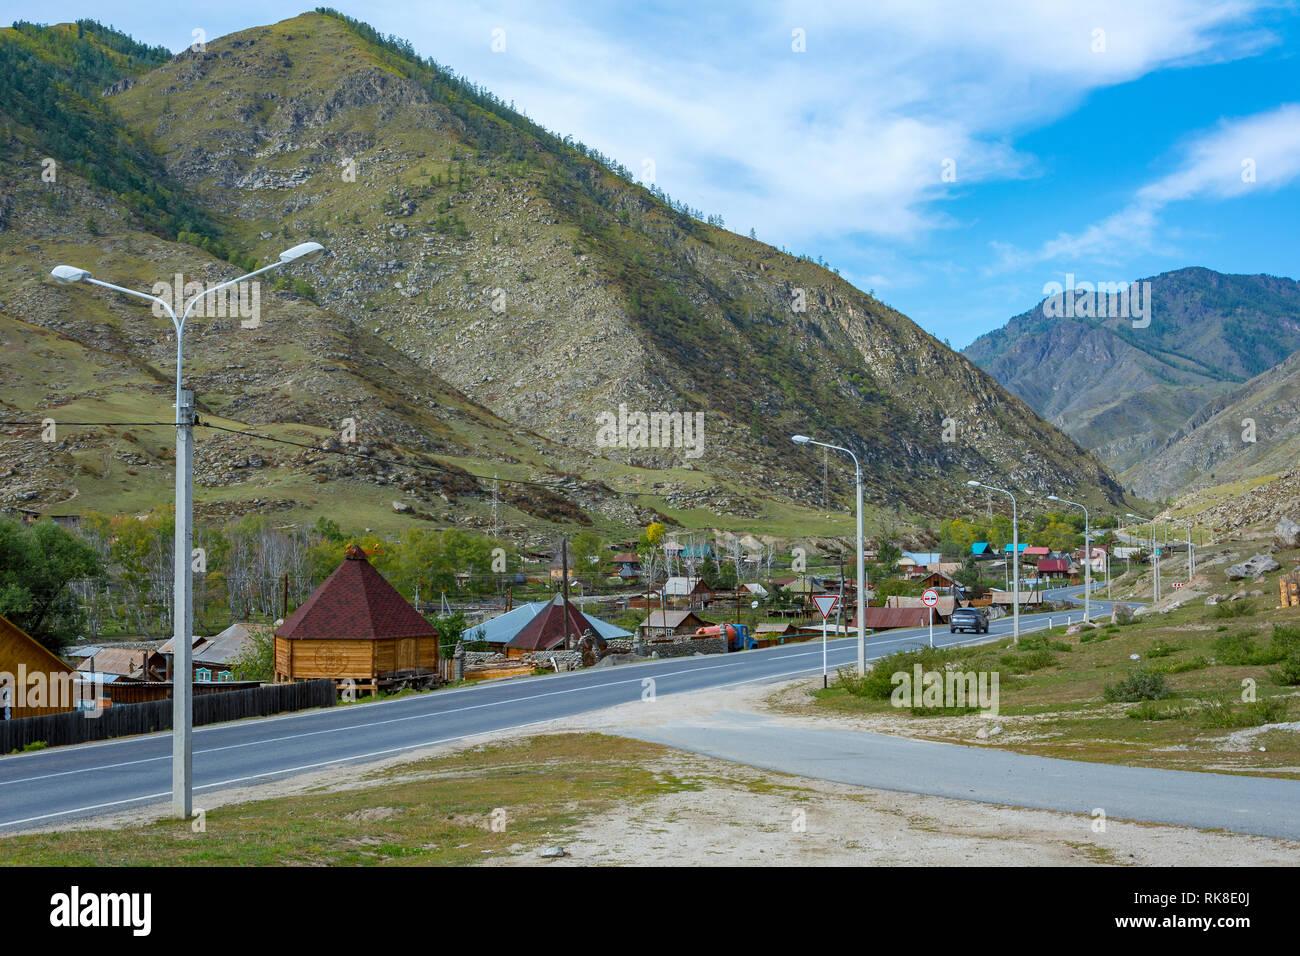 Kupchegen village on the Chuyskiy tract, Altai Republic - Stock Image